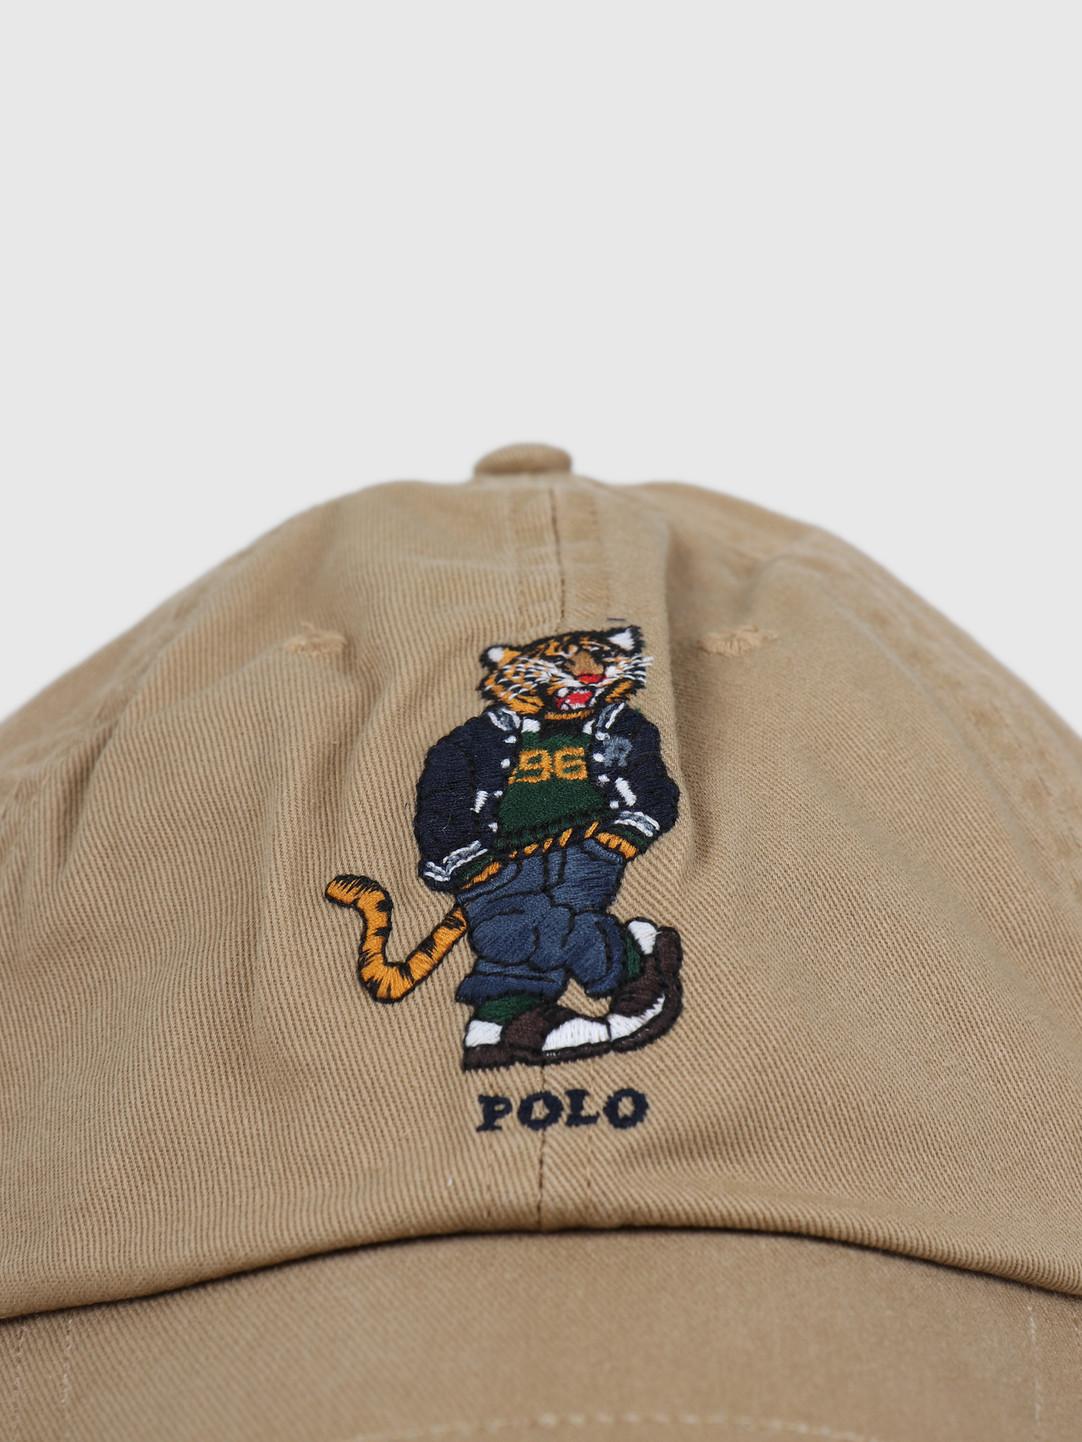 Polo Ralph Lauren Polo Ralph Lauren Cotton Twill-Classic Sport Cap Luxury Tan 710790285001